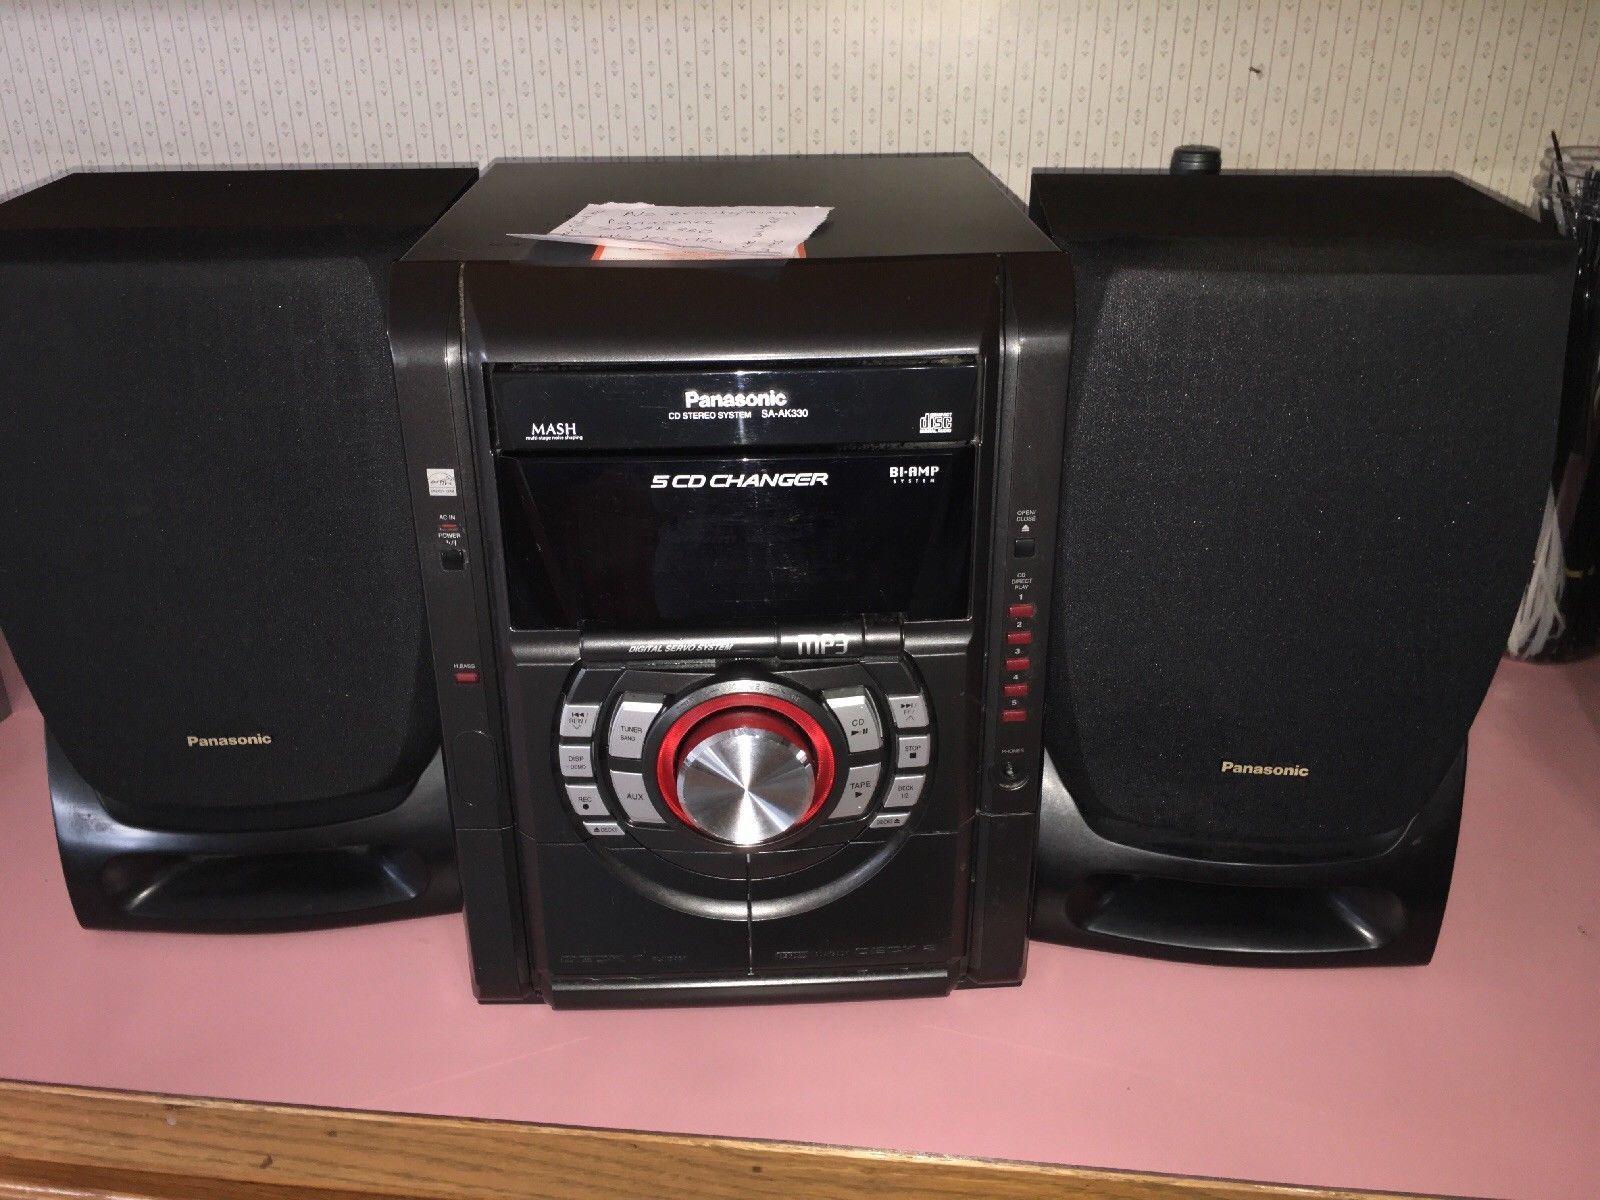 Panasonic Sa-ak330 5 Cd Bookshelf Stereo System Dual Cassette Am Fm With Speaker